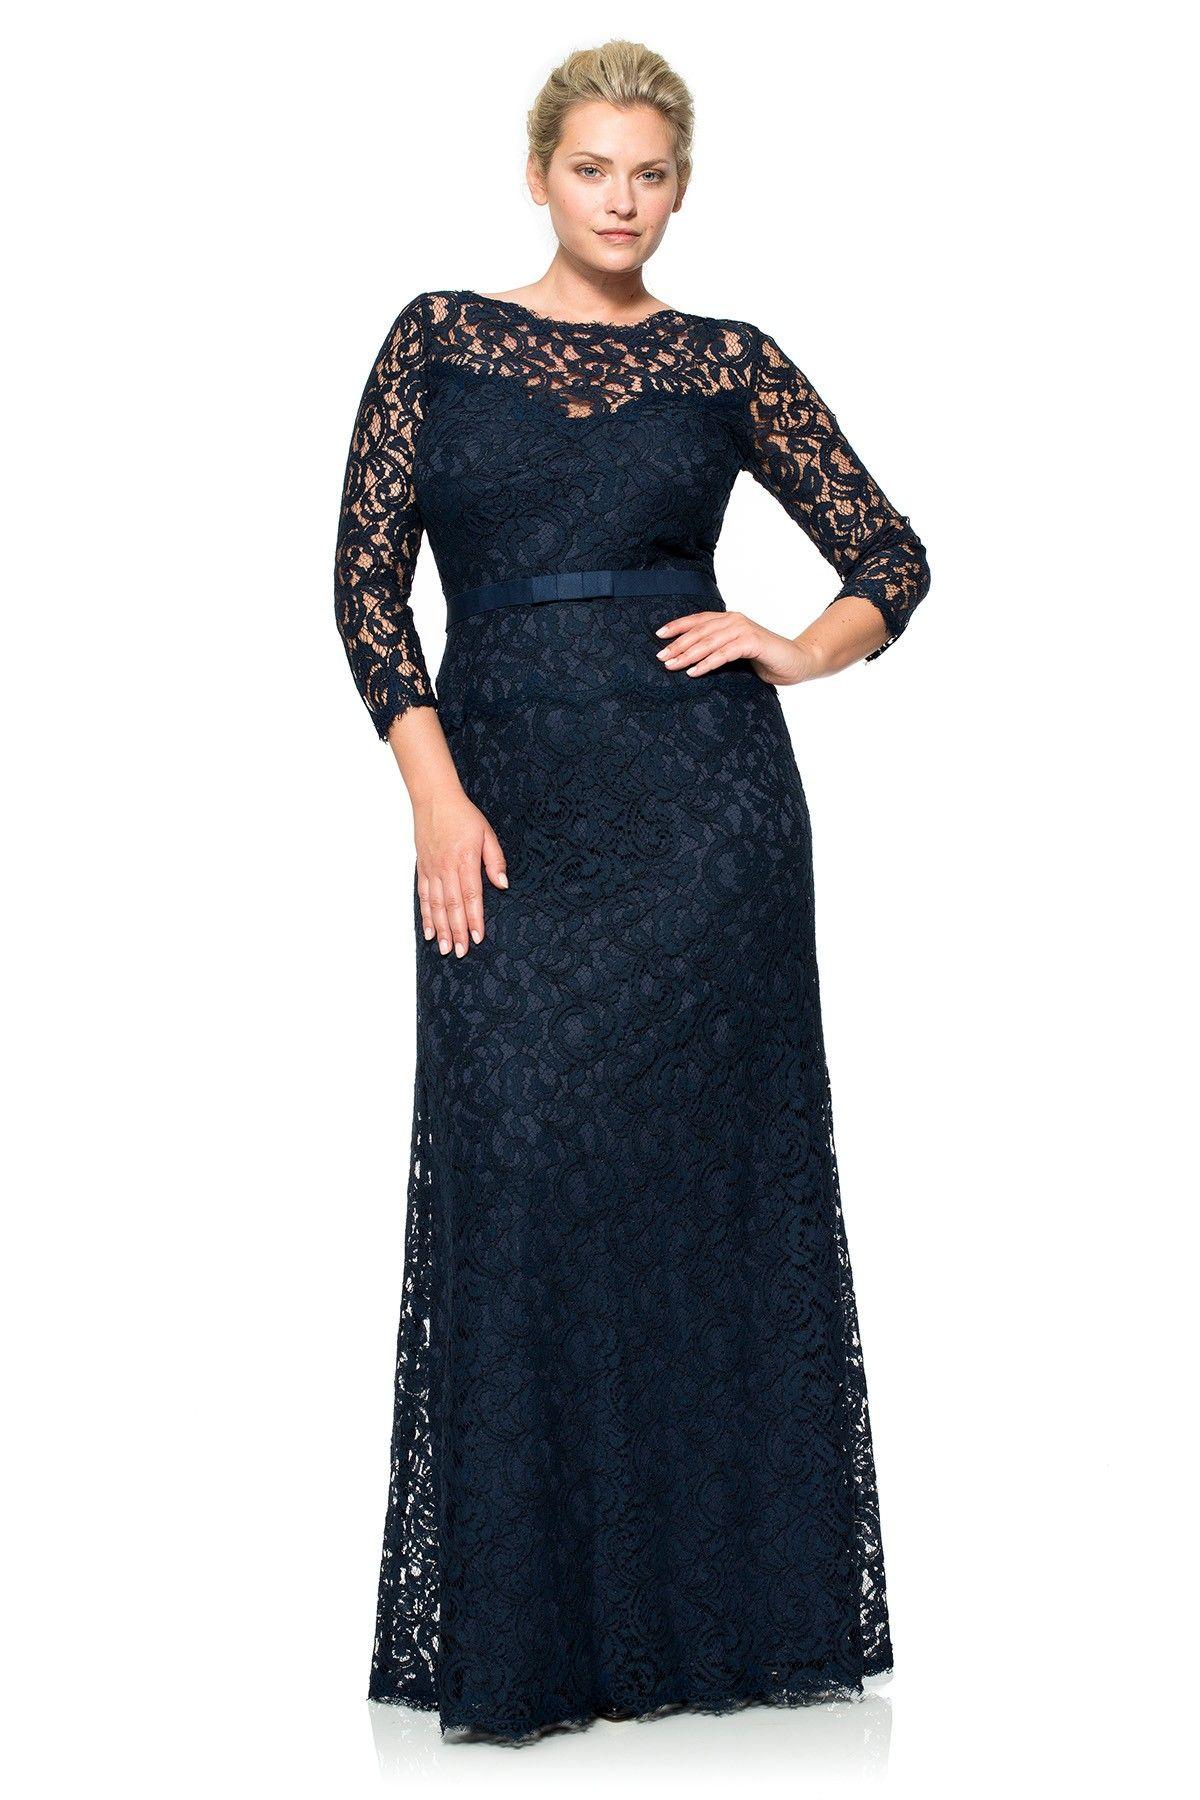 Lace Boatneck ¾ Sleeve Gown with Grosgrain Ribbon Belt - PLUS SIZE | Tadashi Shoji